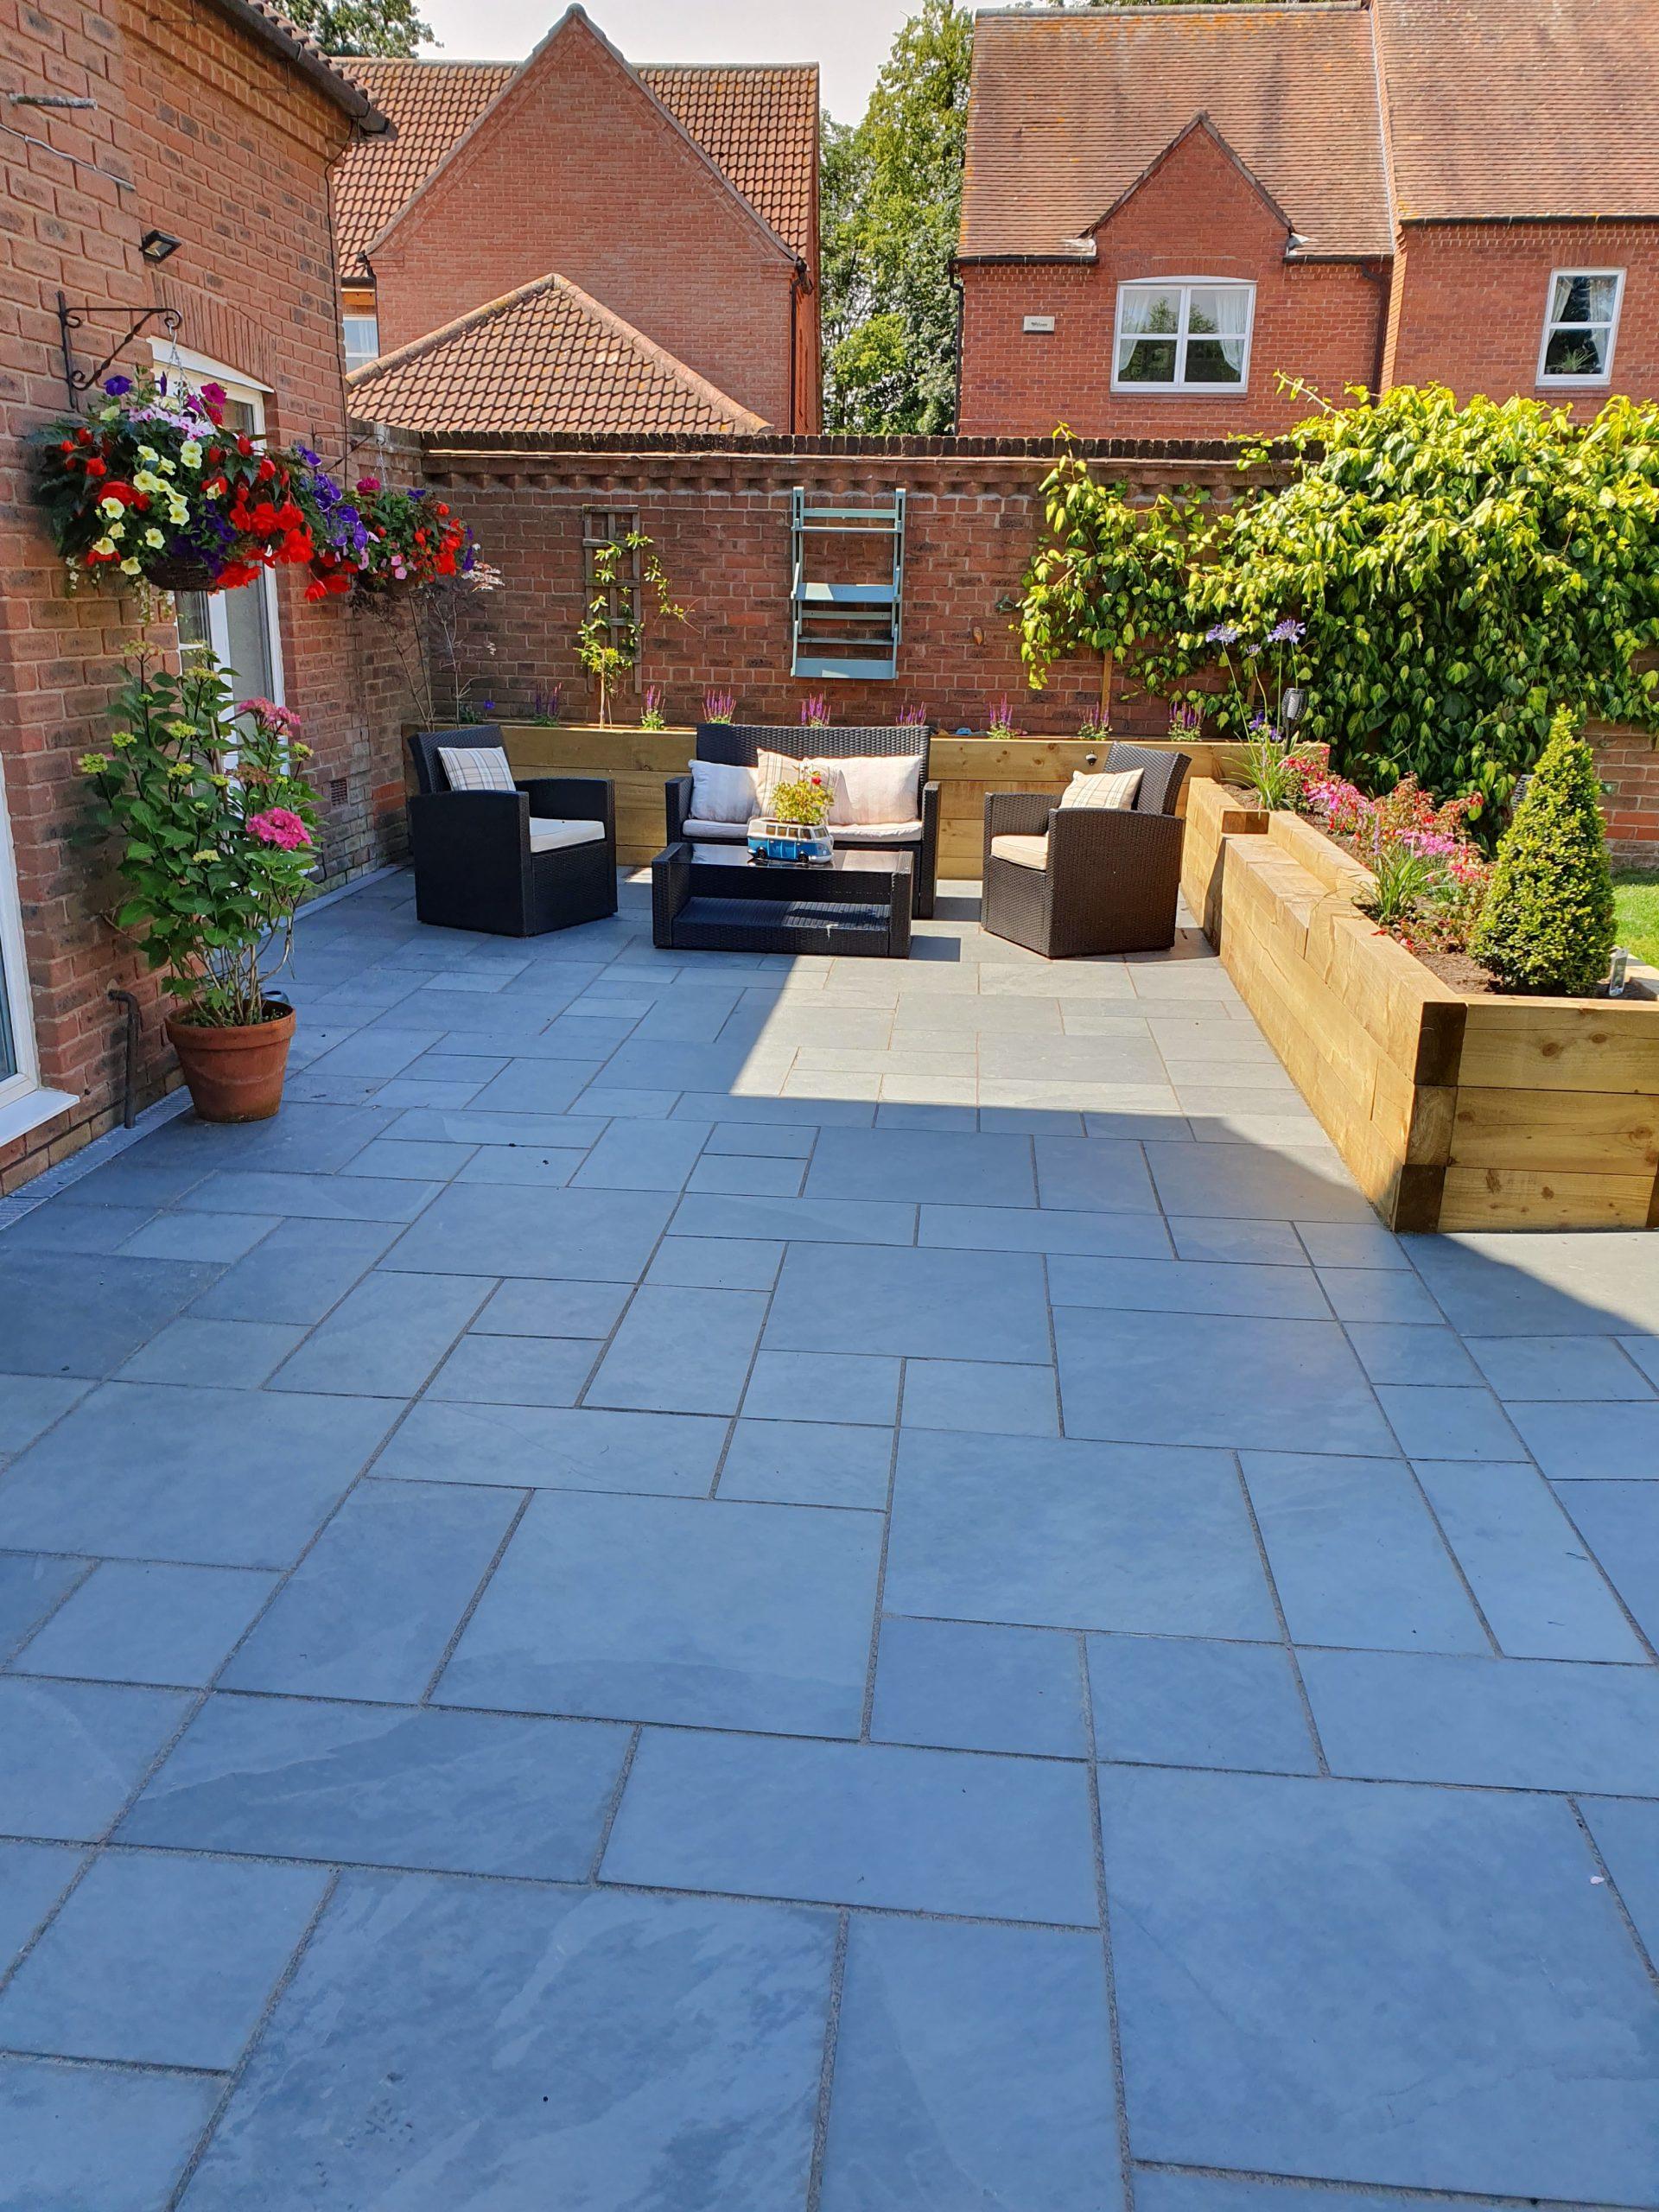 Garden patio seating area with wooden sleeper raised borders